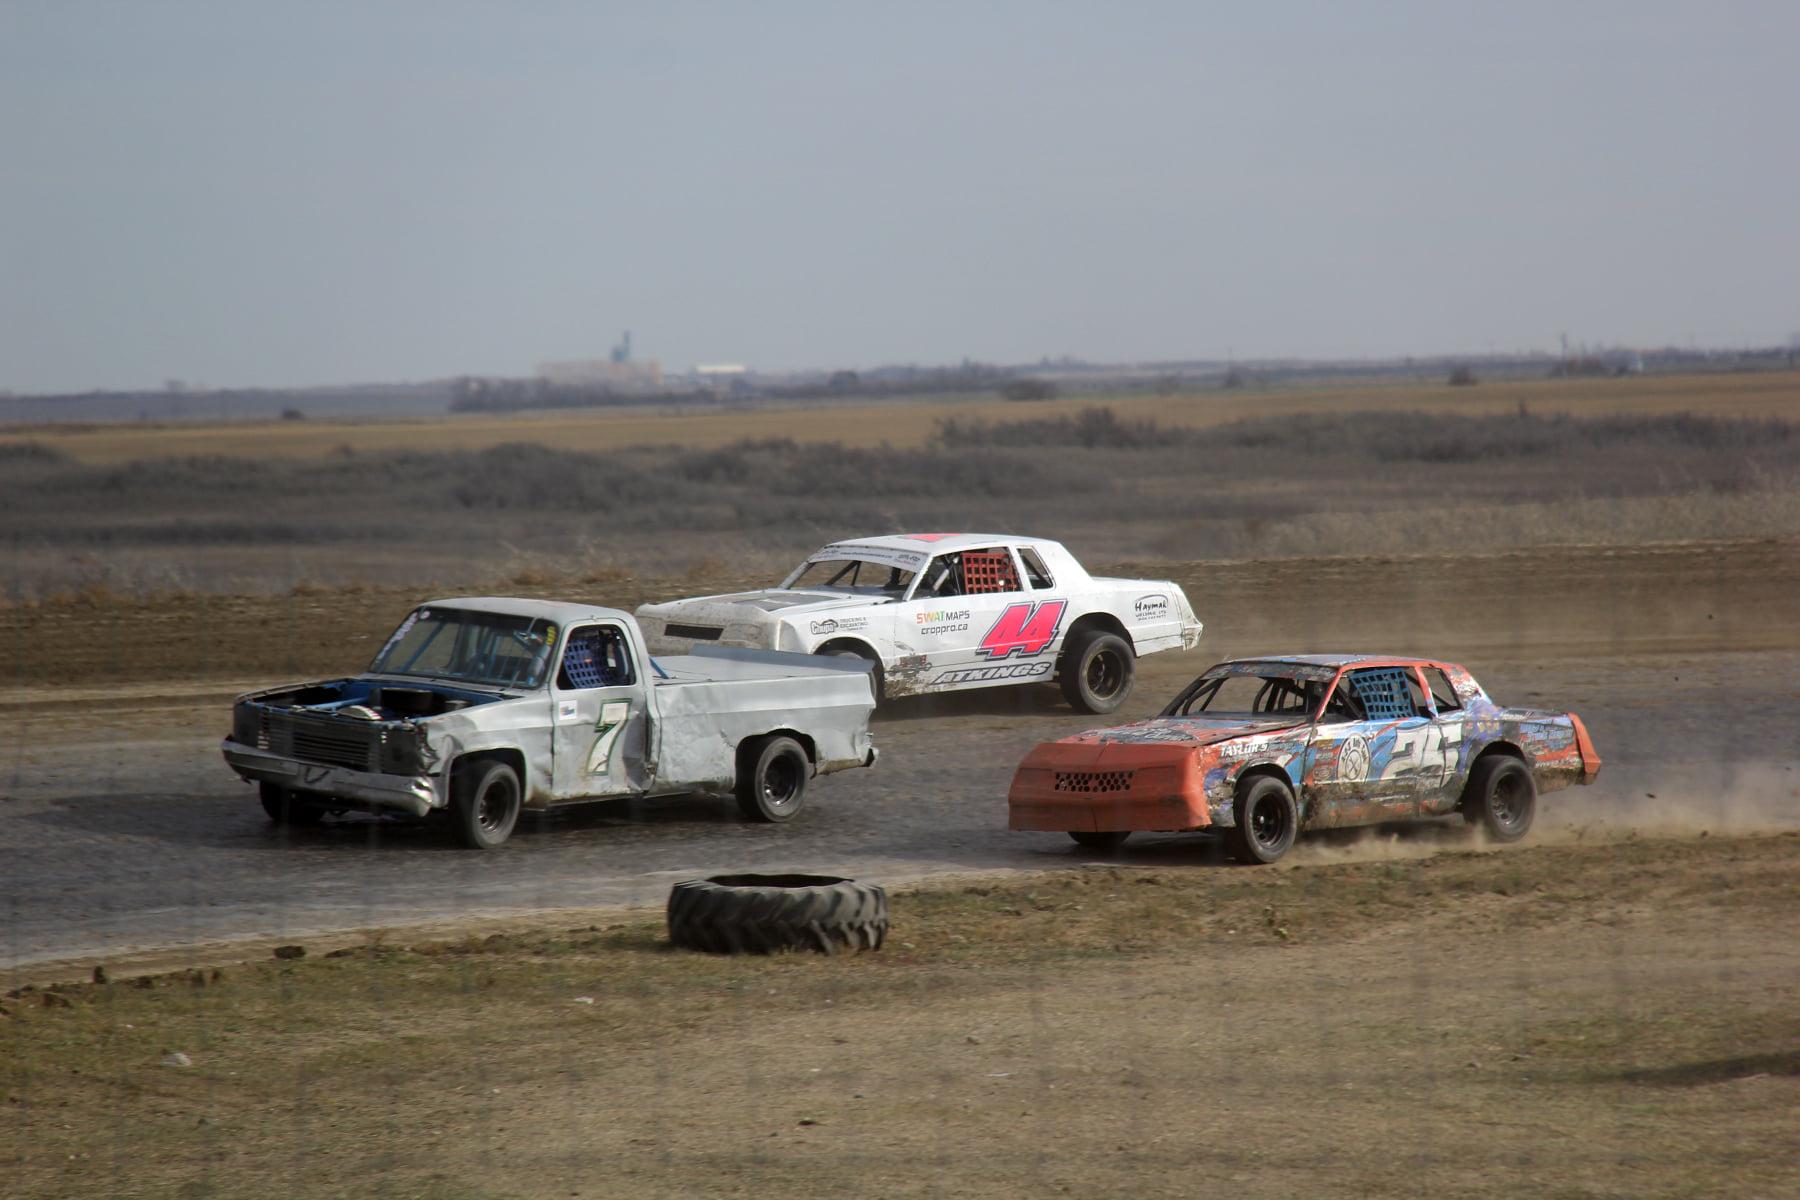 Outlook_Racing_Kemmer_Racing_Photography_21.jpg